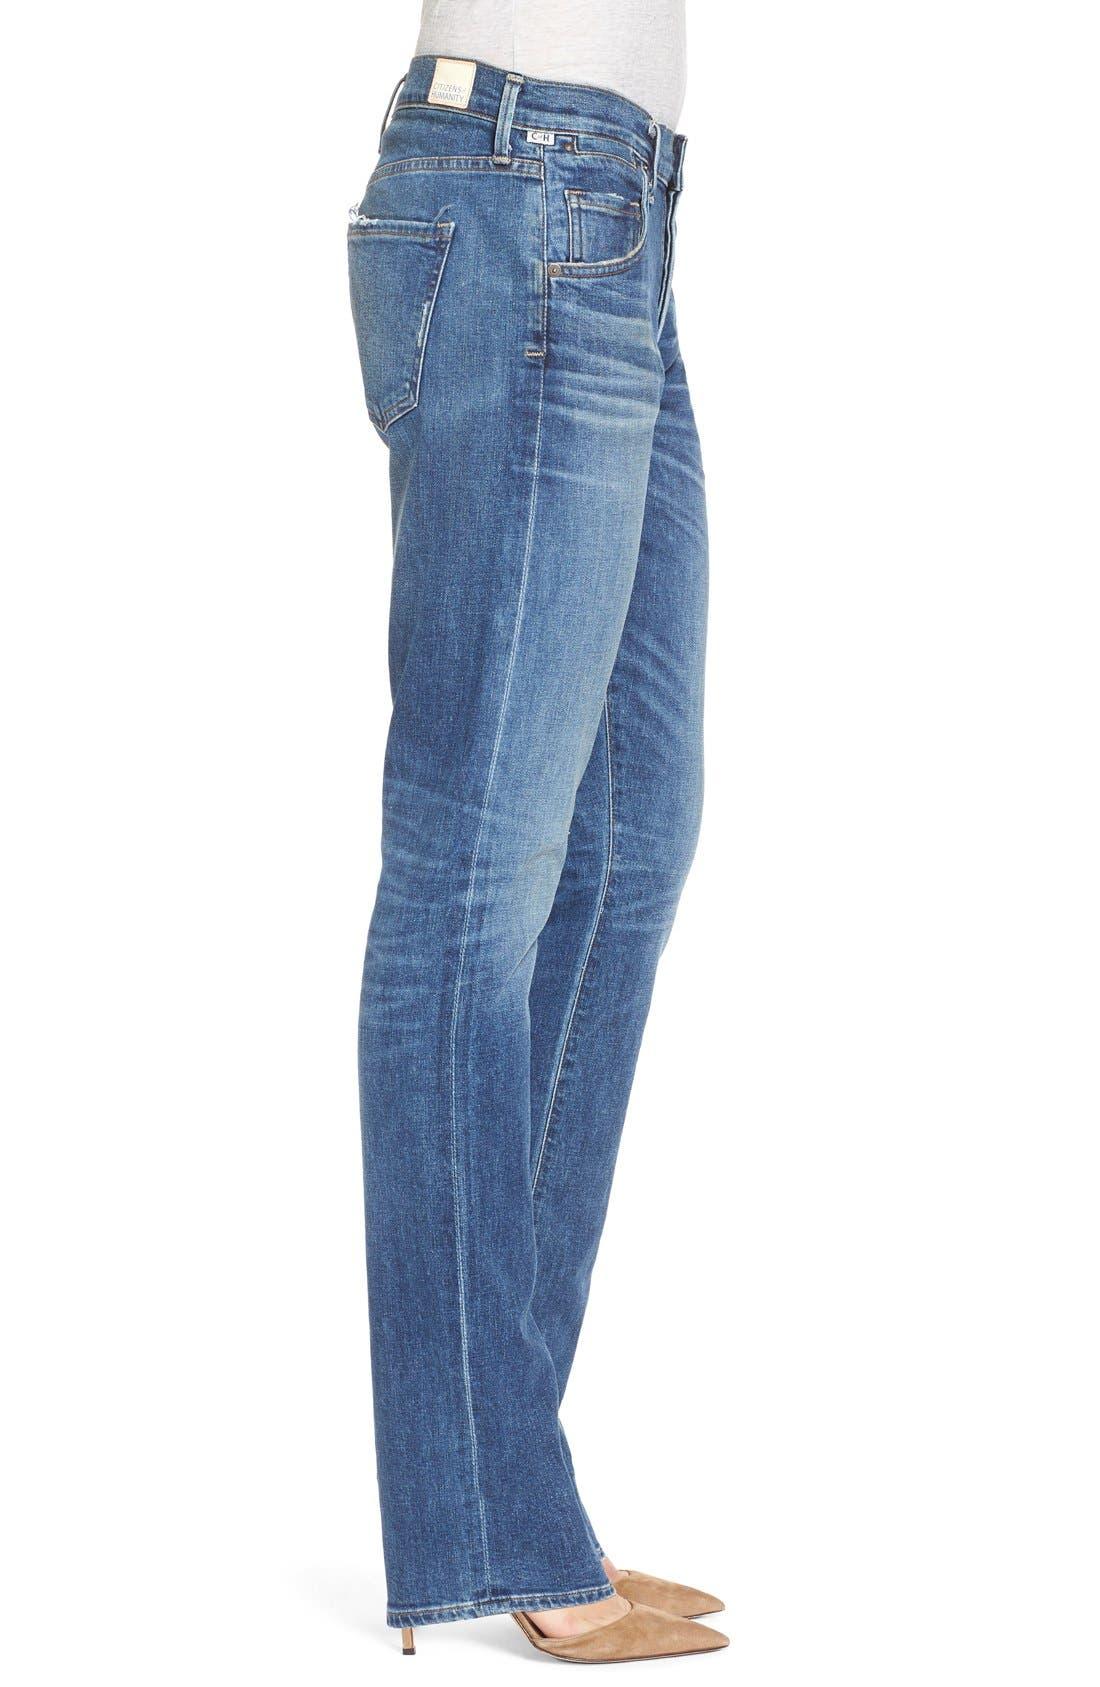 'Emerson Long' Slim Boyfriend Jeans,                             Alternate thumbnail 4, color,                             421